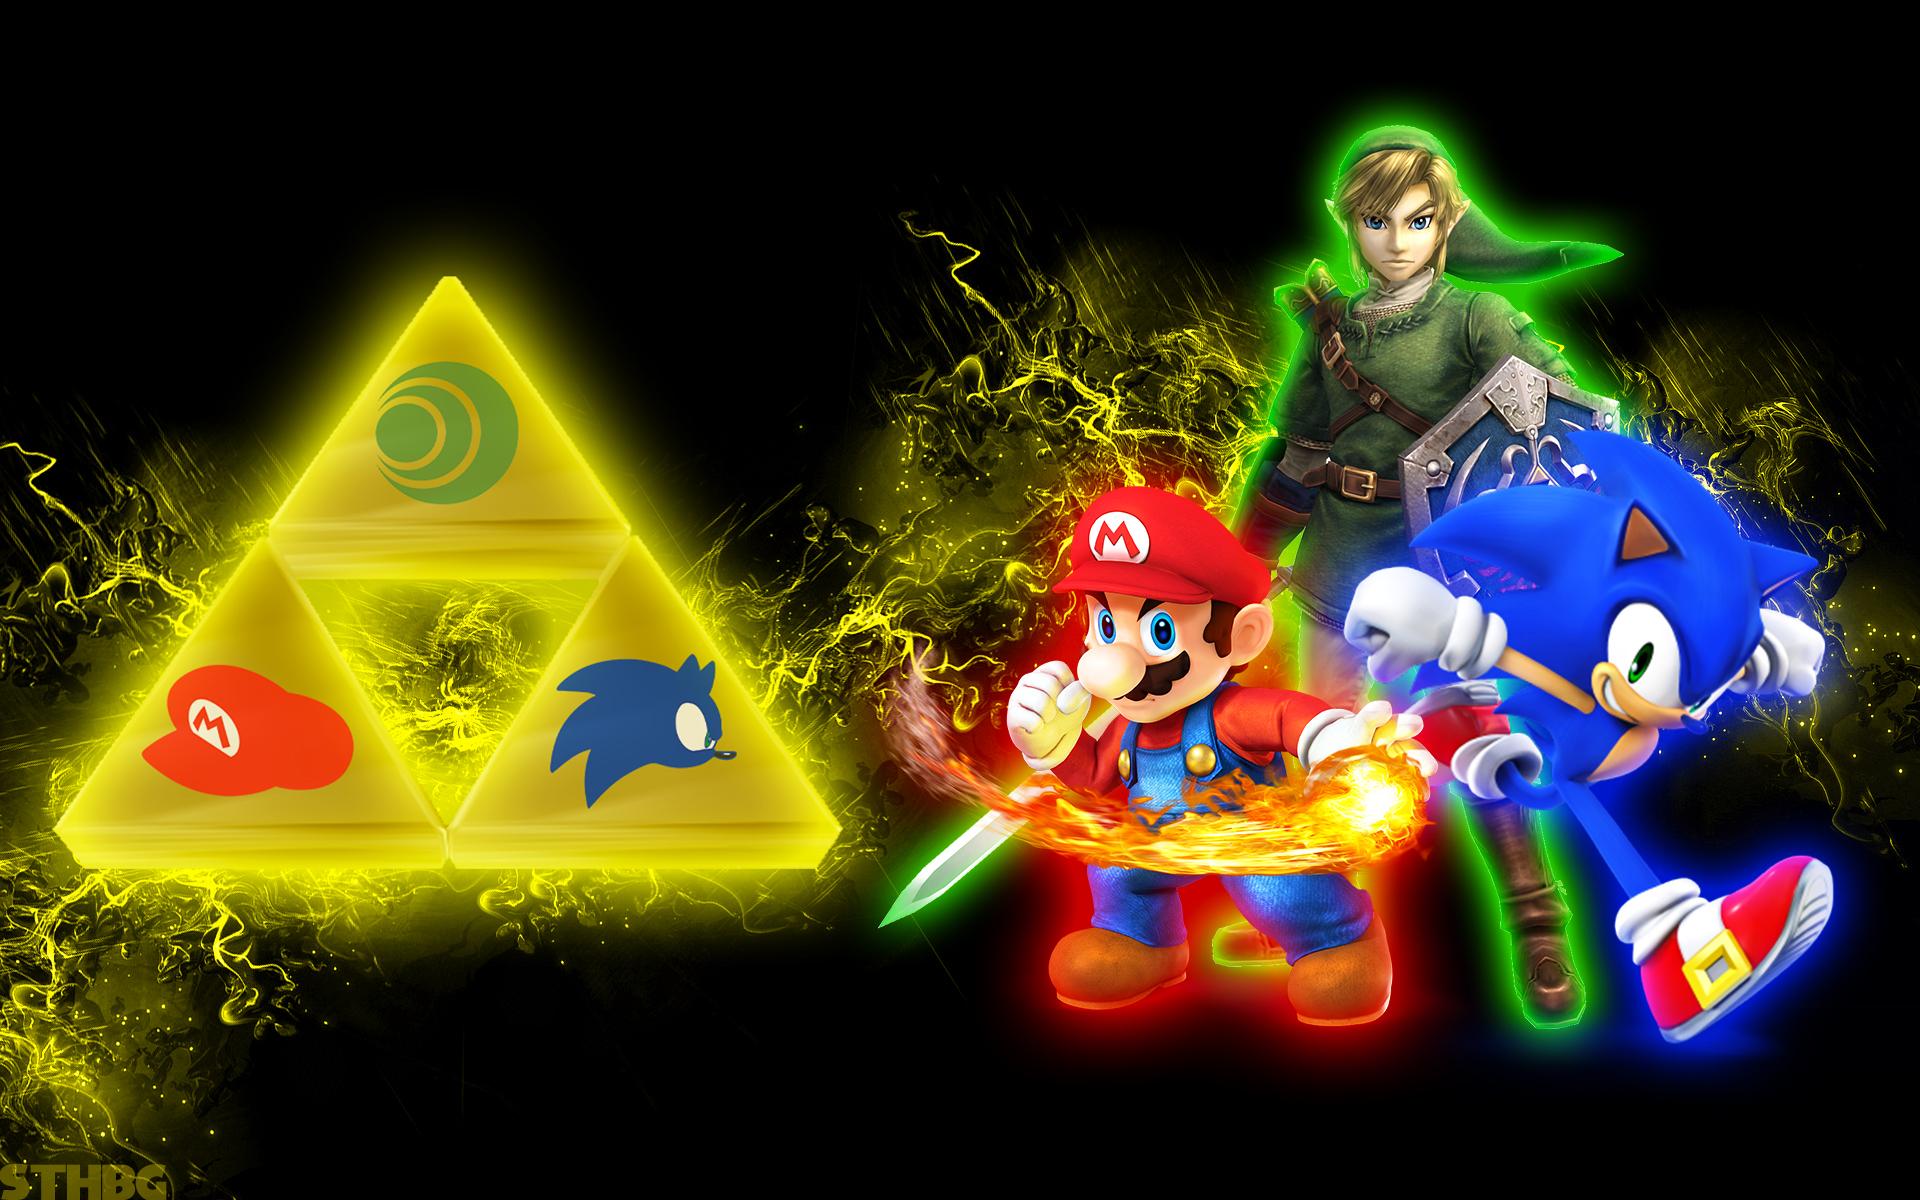 SonicTheHedgehogBG LinkMario And Sonic